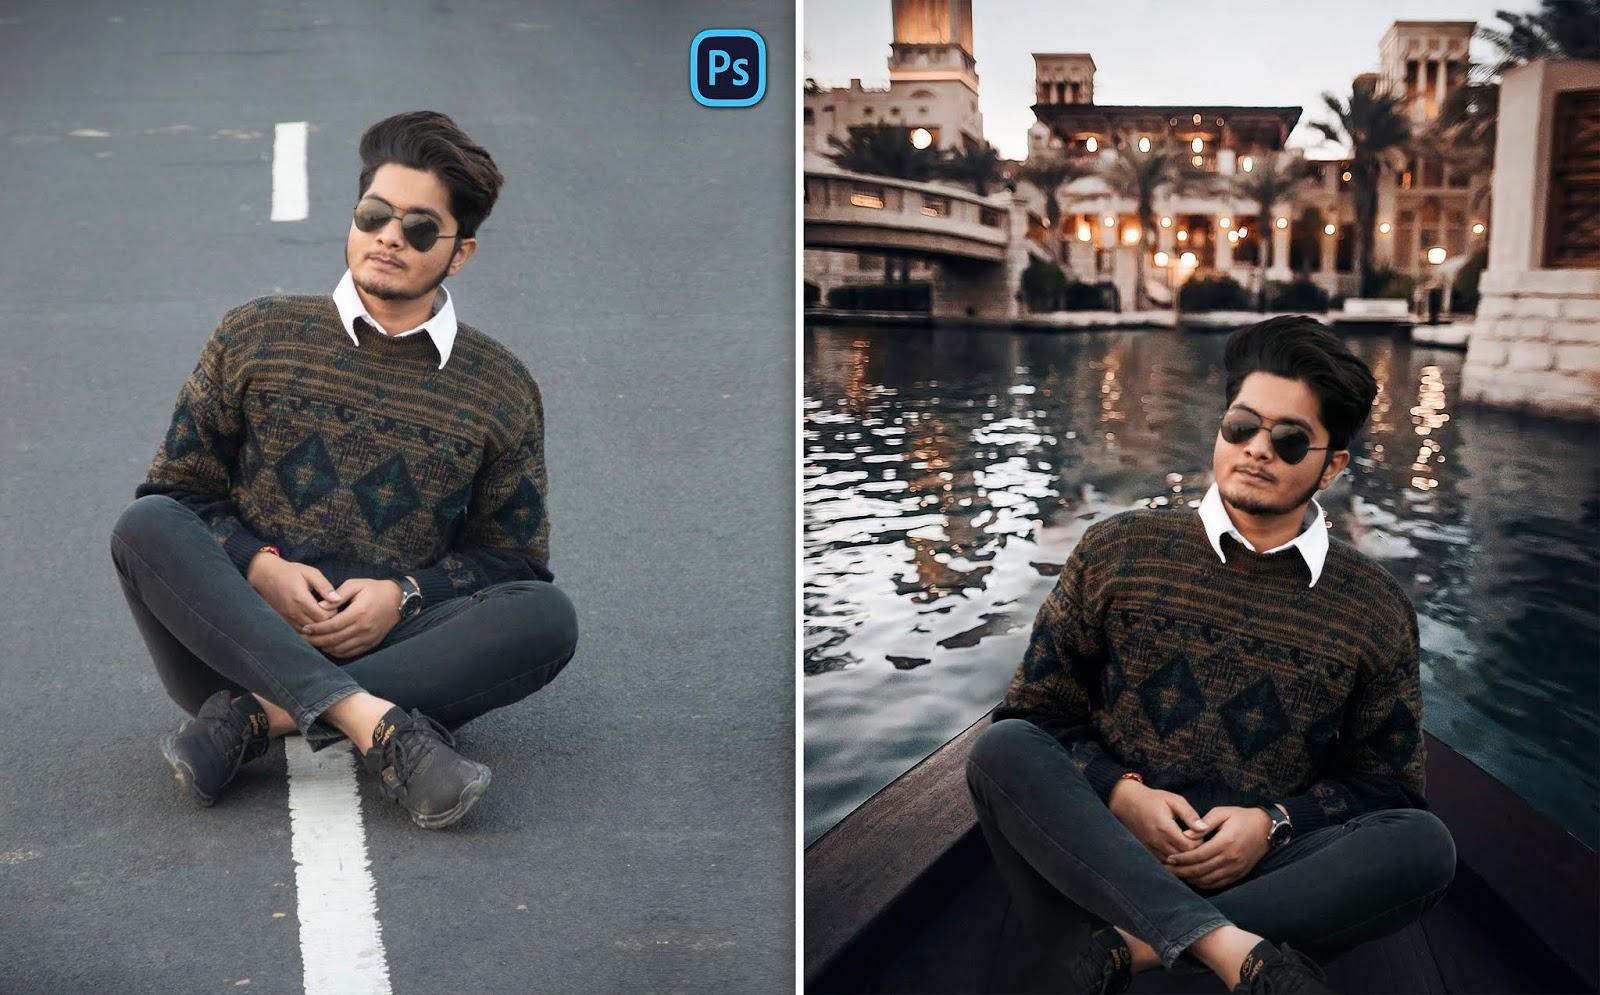 How to Edit Like Toni Mahfud in Photoshop cc | Toni Mahfud Style Photo Editing in Photoshop cc